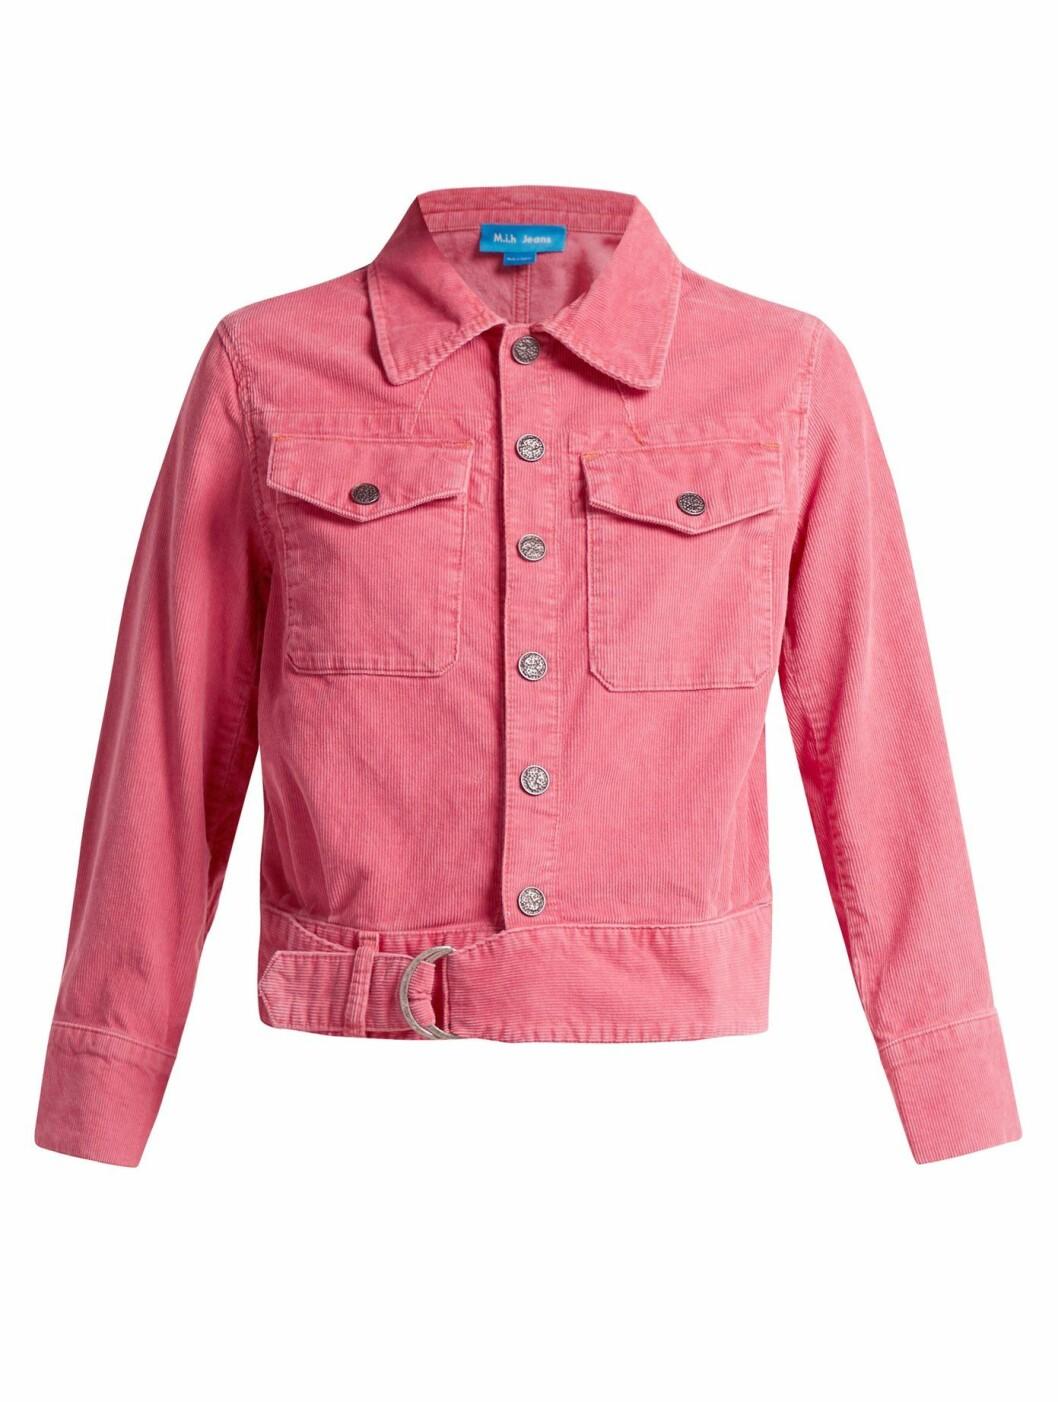 Jakke fra M.i.H Jeans  2170,-  https://www.matchesfashion.com/intl/products/M-i-h-Jeans-Paradise-cropped-corduroy-jacket-1208700